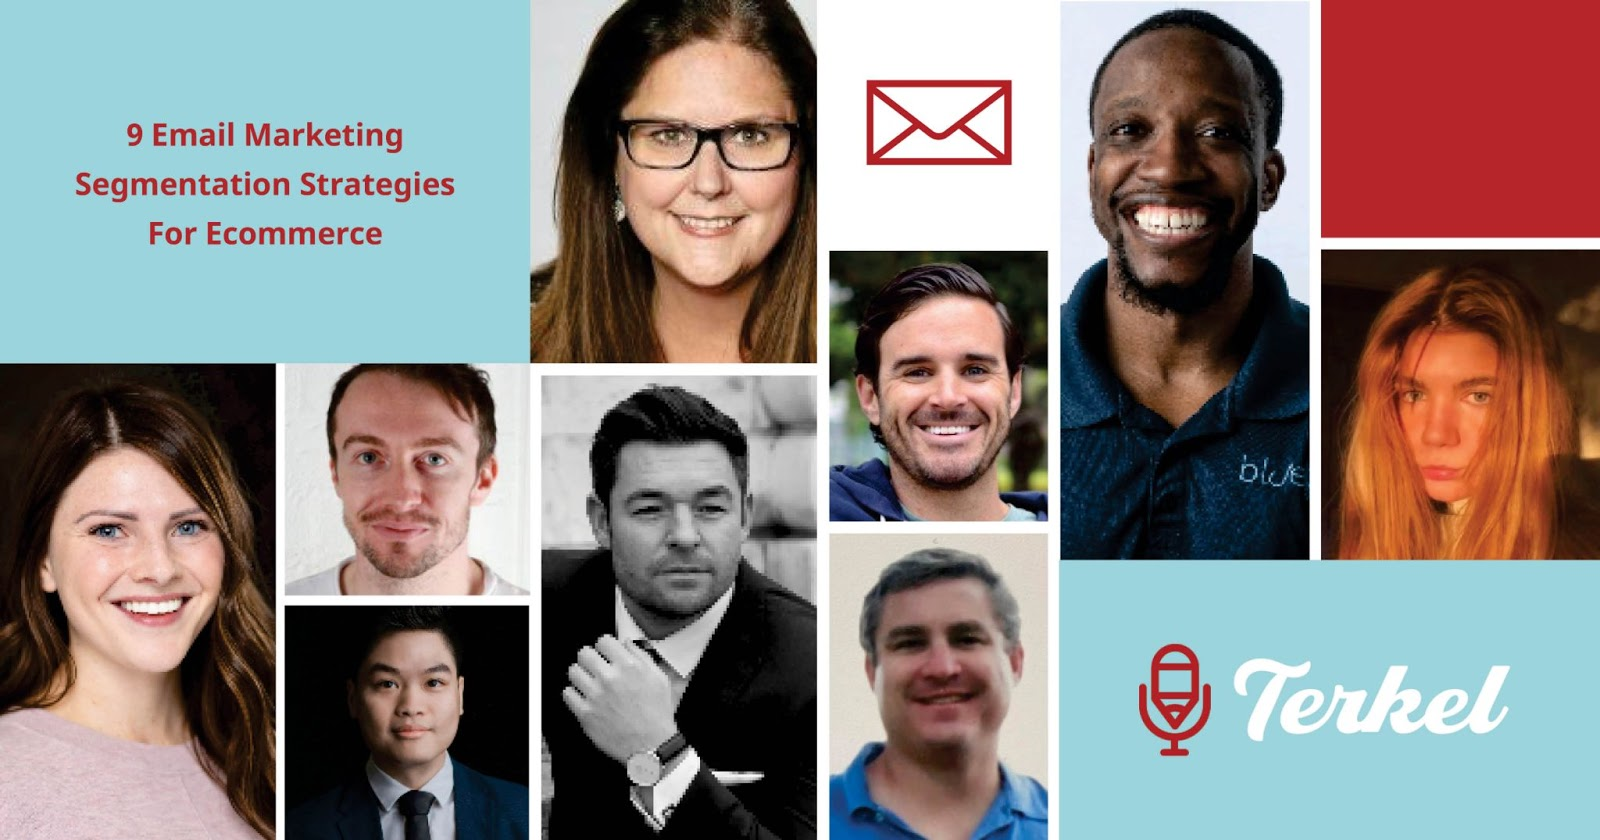 9 Email Marketing Segmentation Strategies For Ecommerce (1)